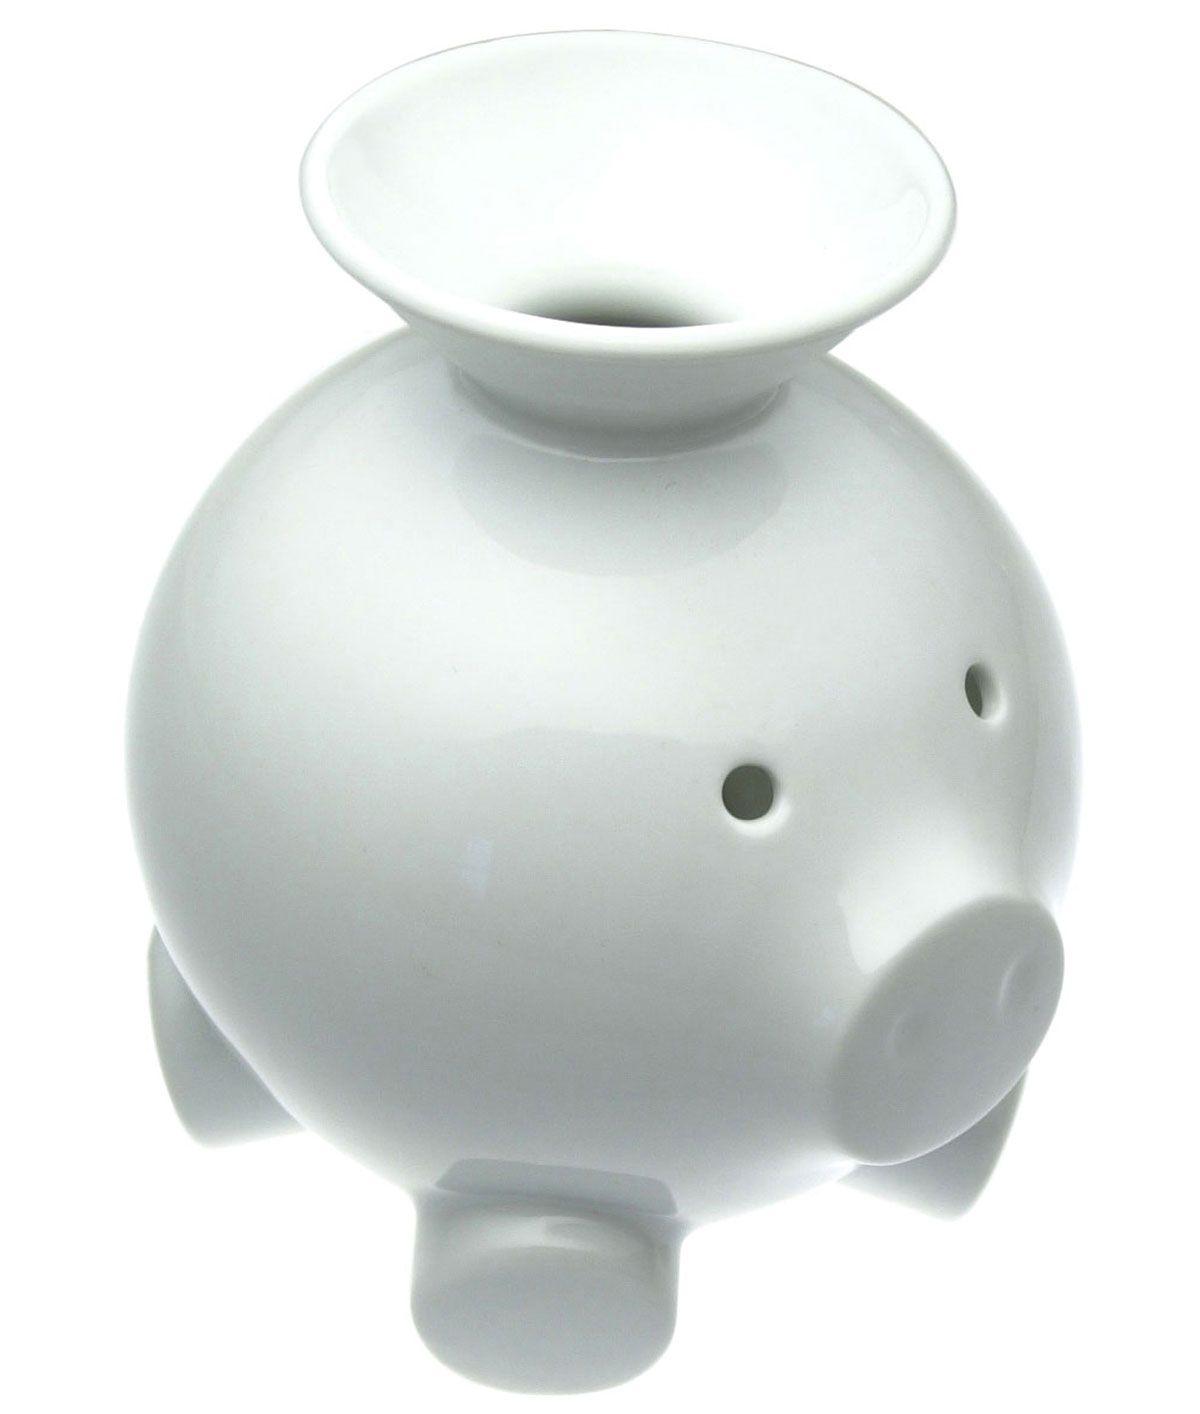 Coink Bank White Porcelain Piggy Bank Modern Funnel Opening